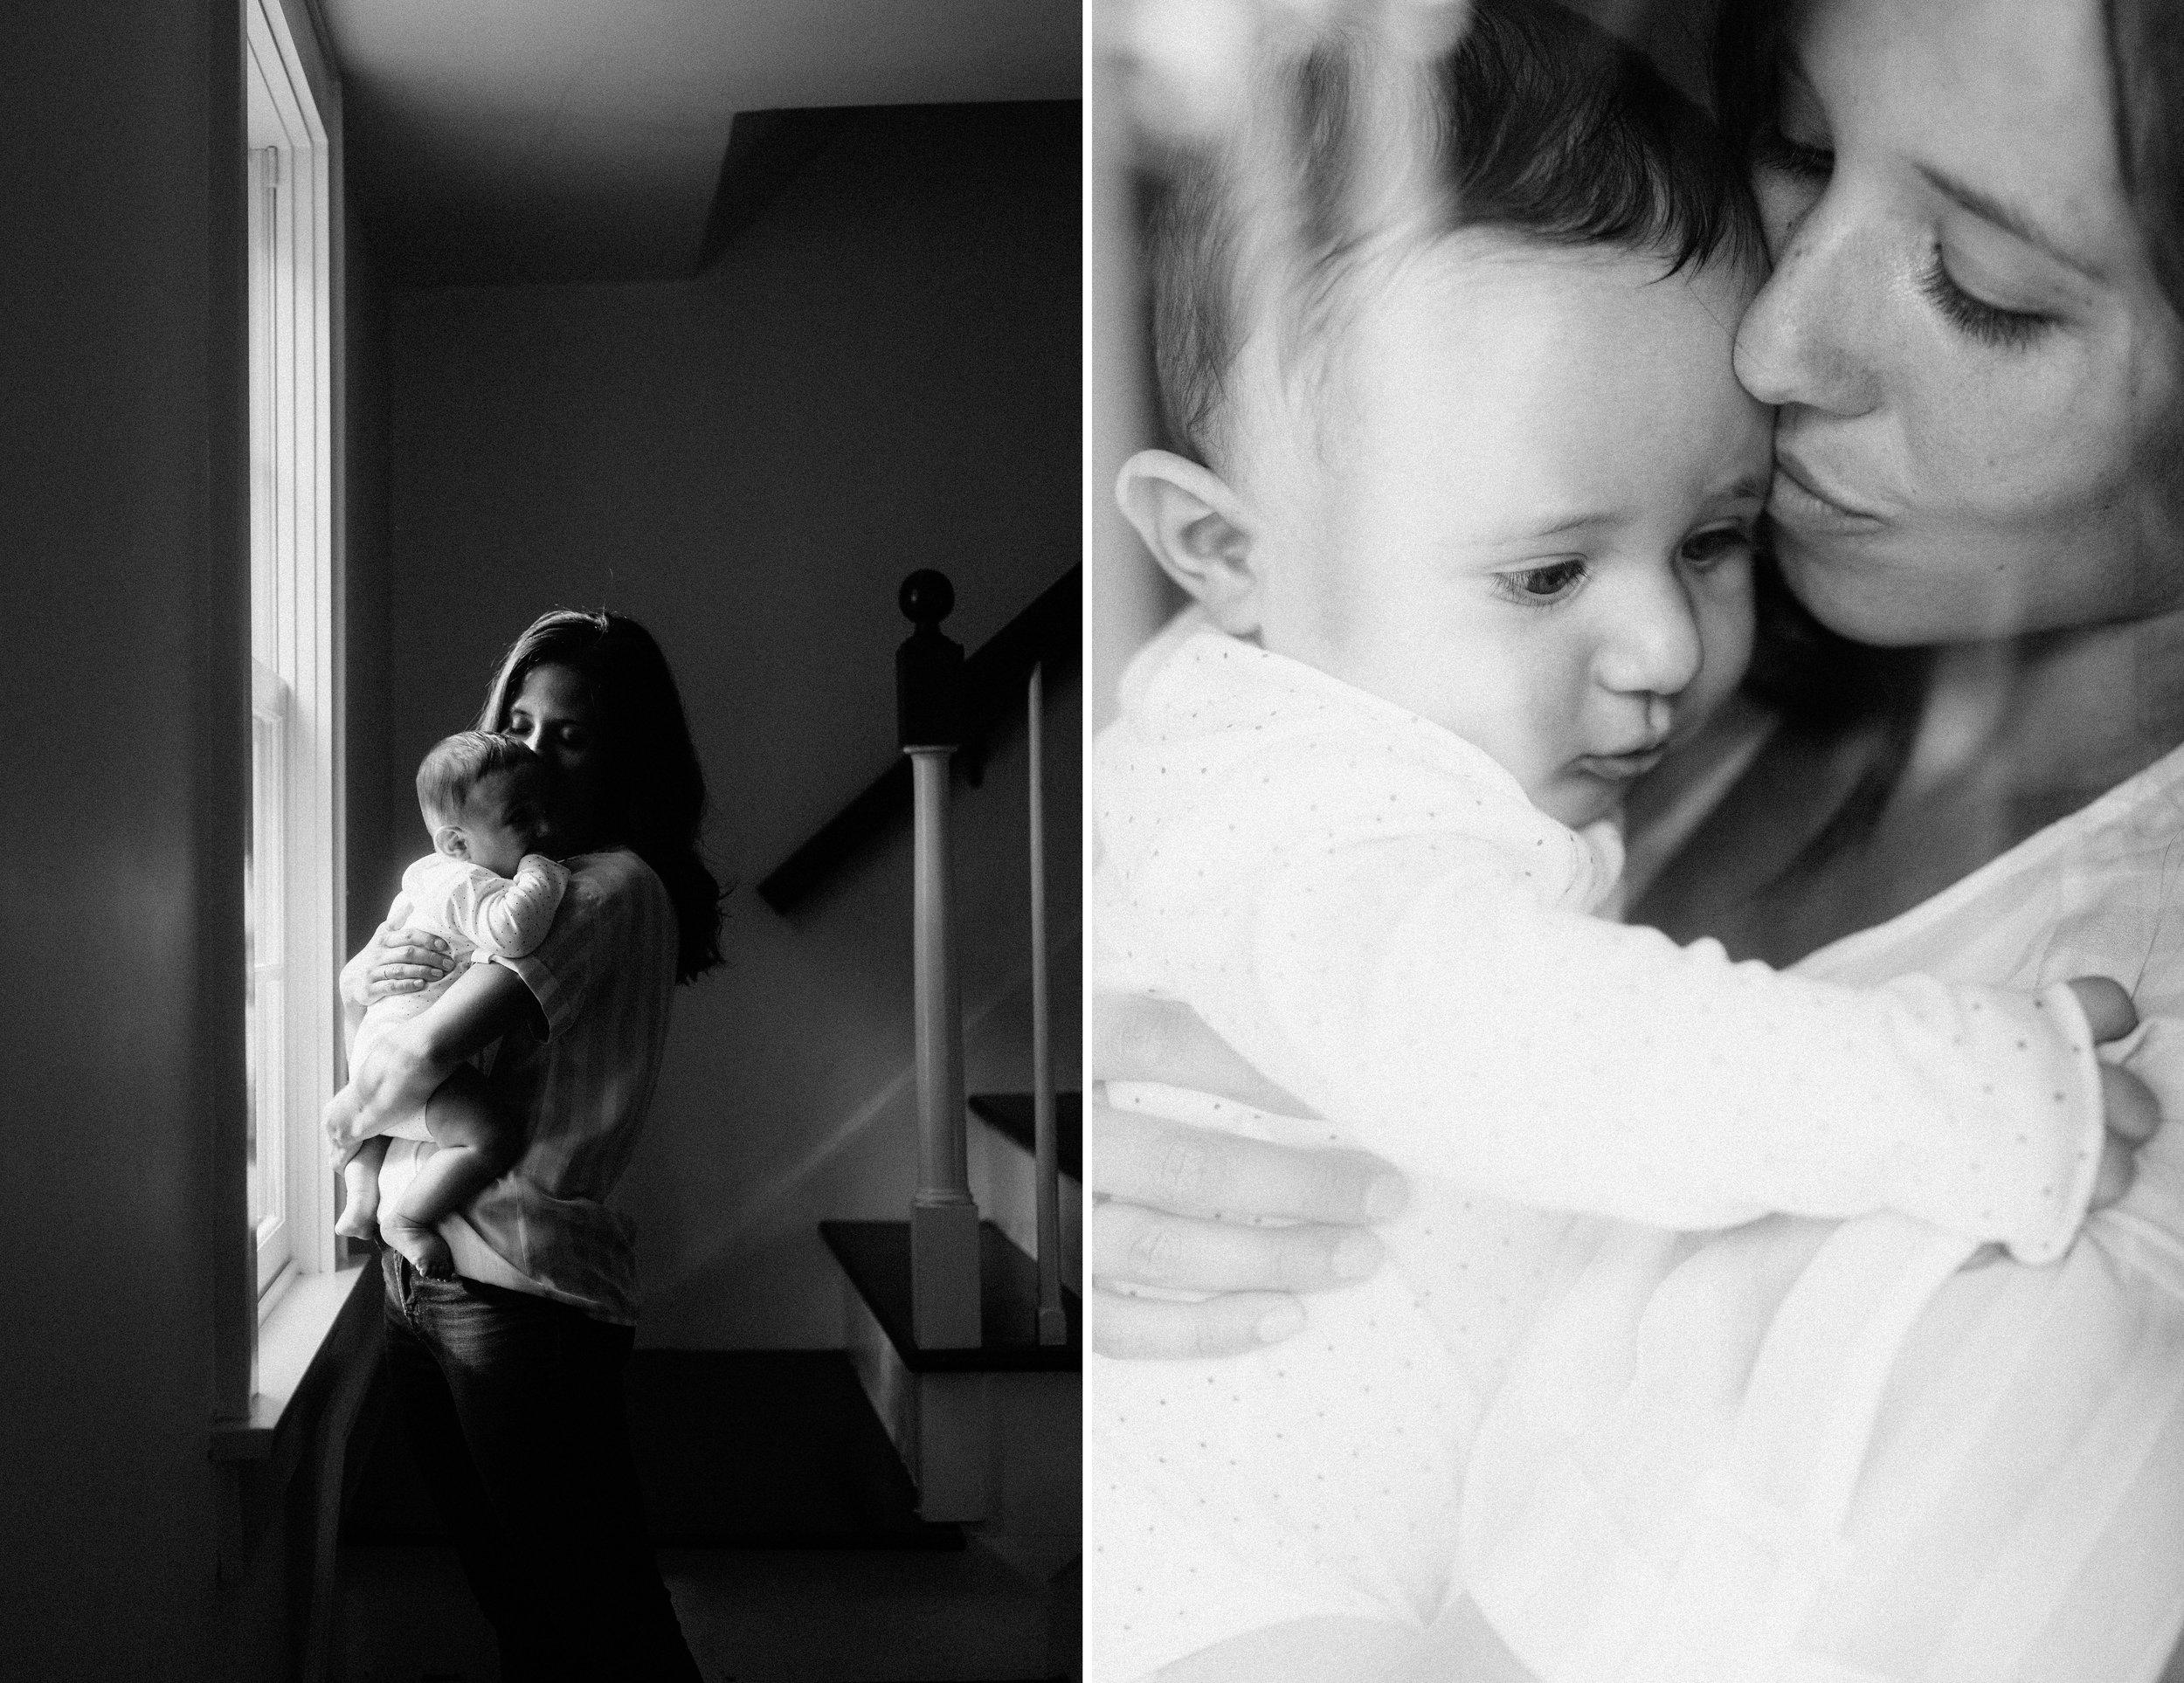 ashley-caroline_nicki-sebastian-photography_connecticut_california_family-photographer_baby-photography-6.jpg